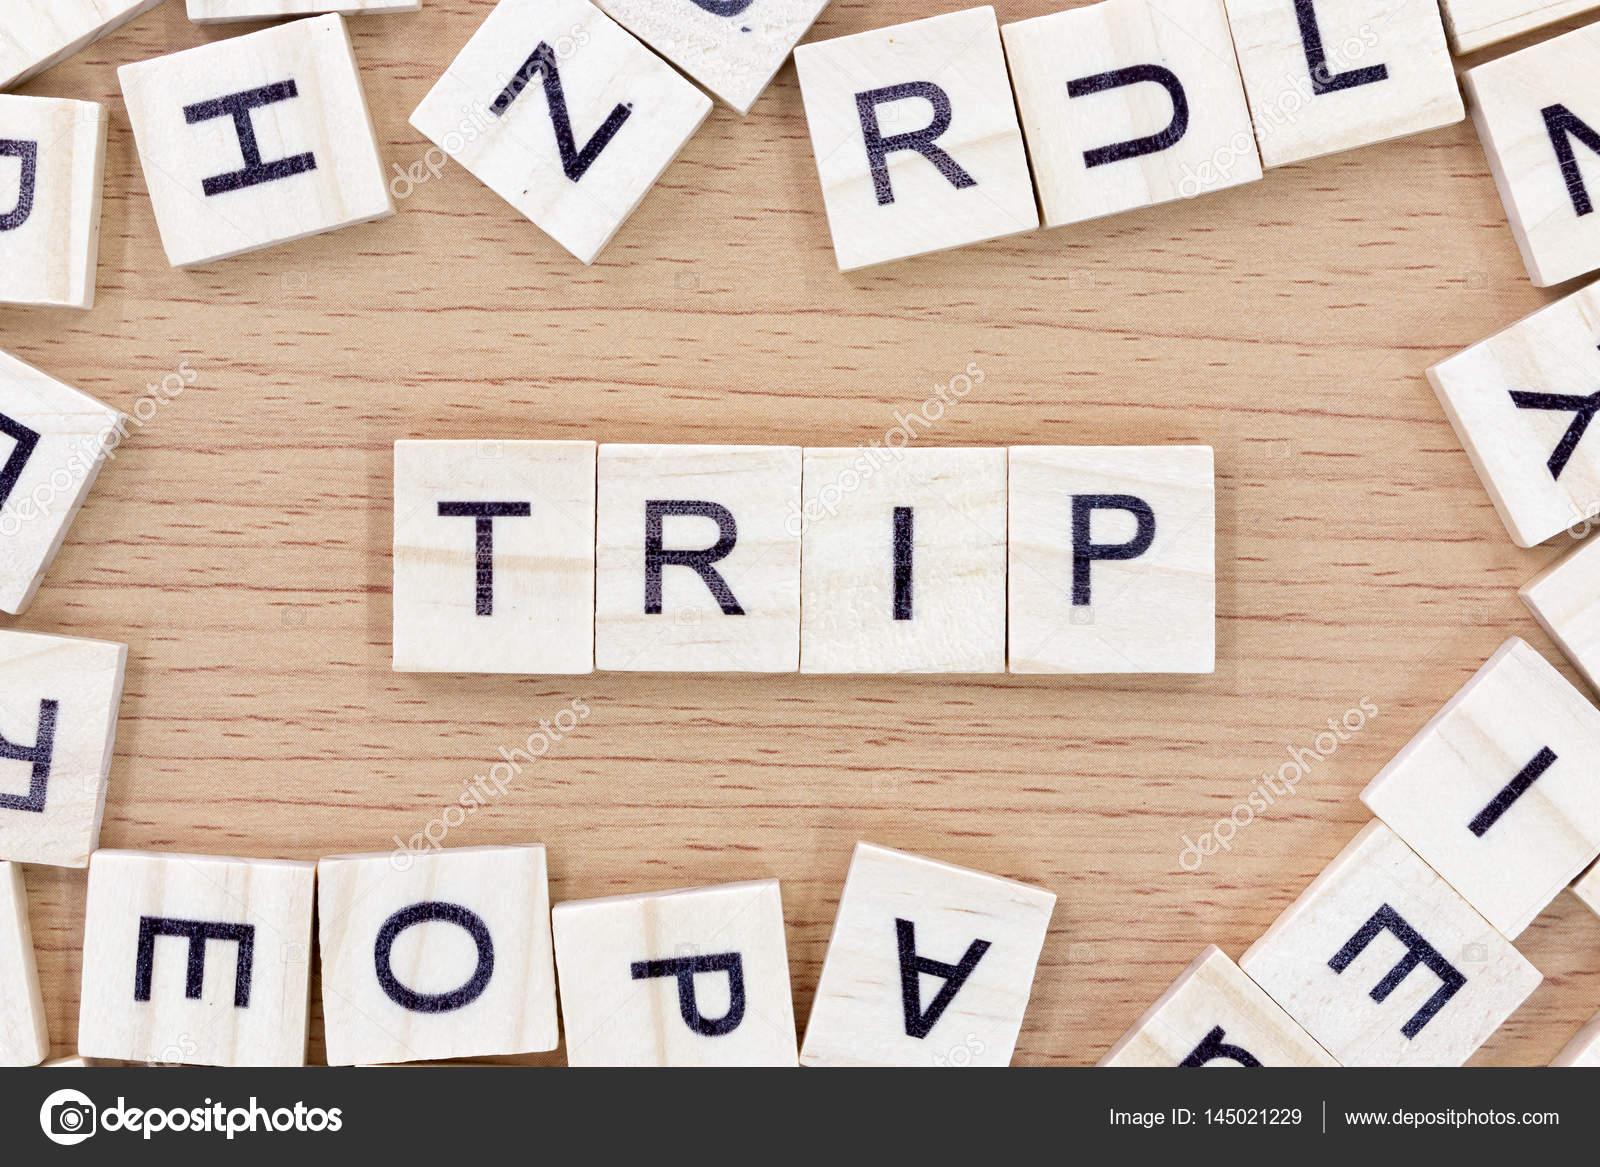 trip words with wooden blocks stock photo sirichaideposit 145021229